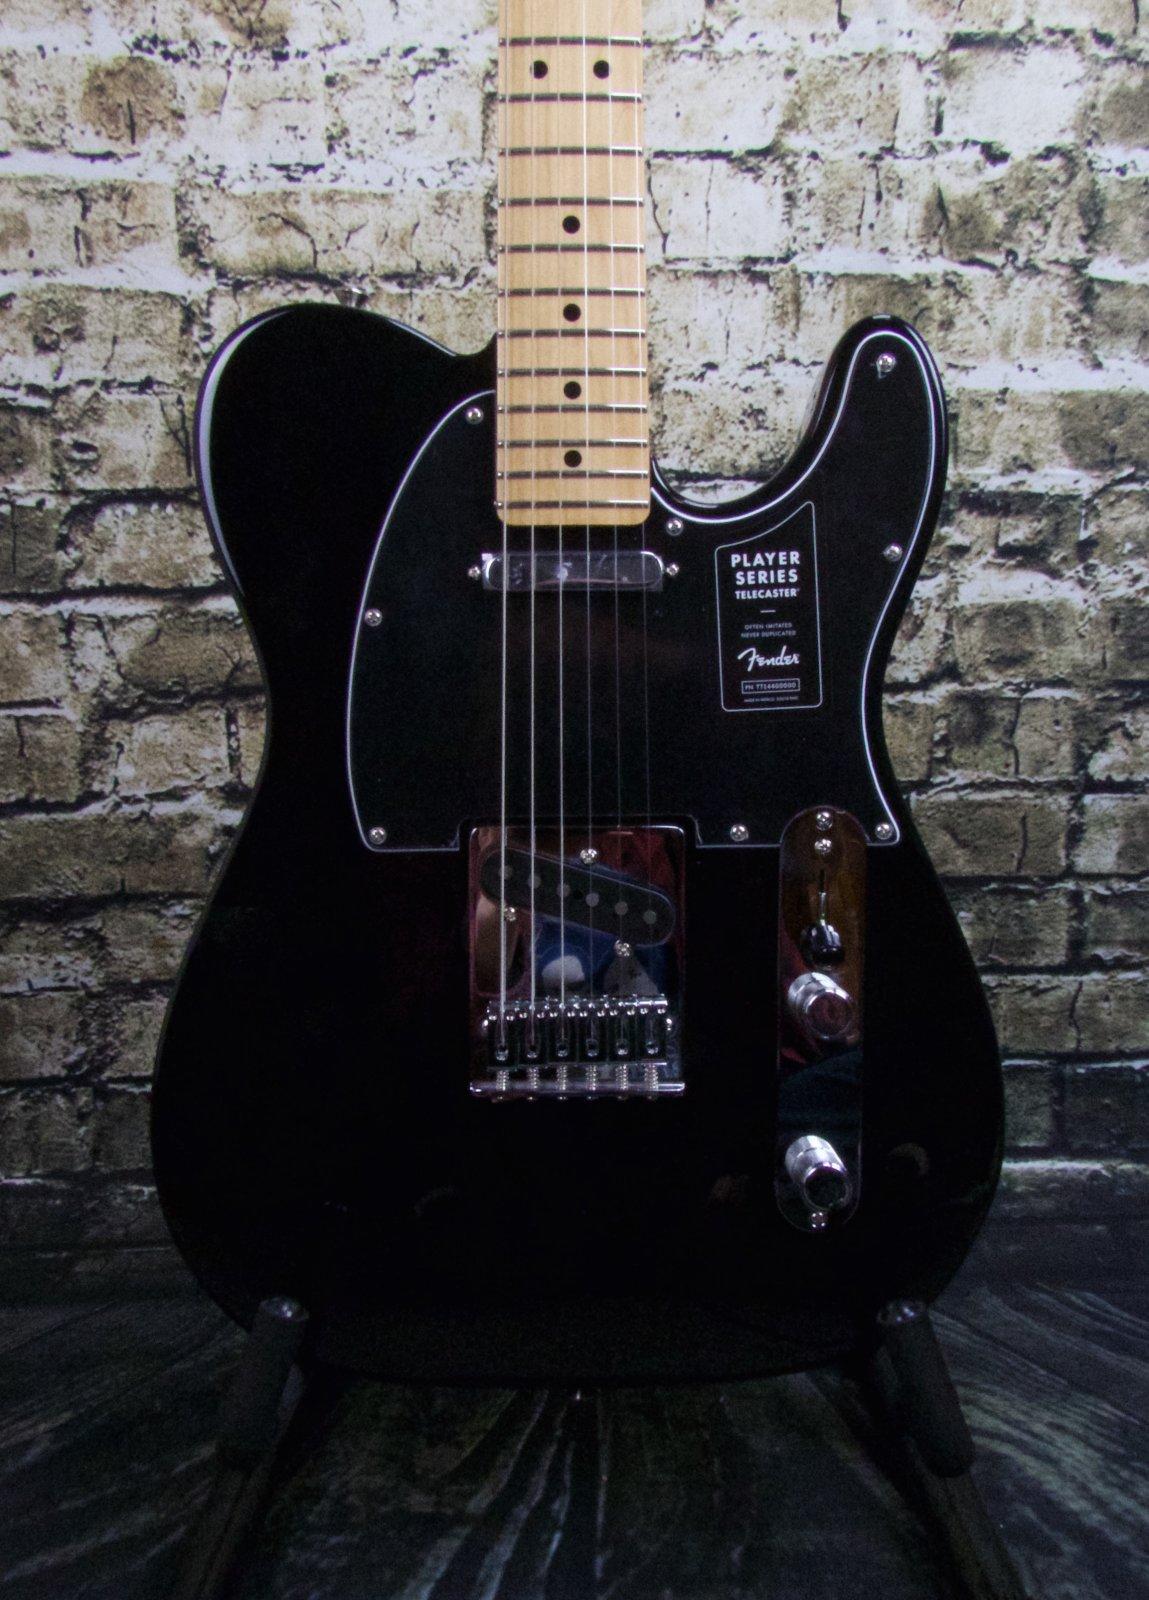 Fender Player Telecaster Maple Fingerboard - Black